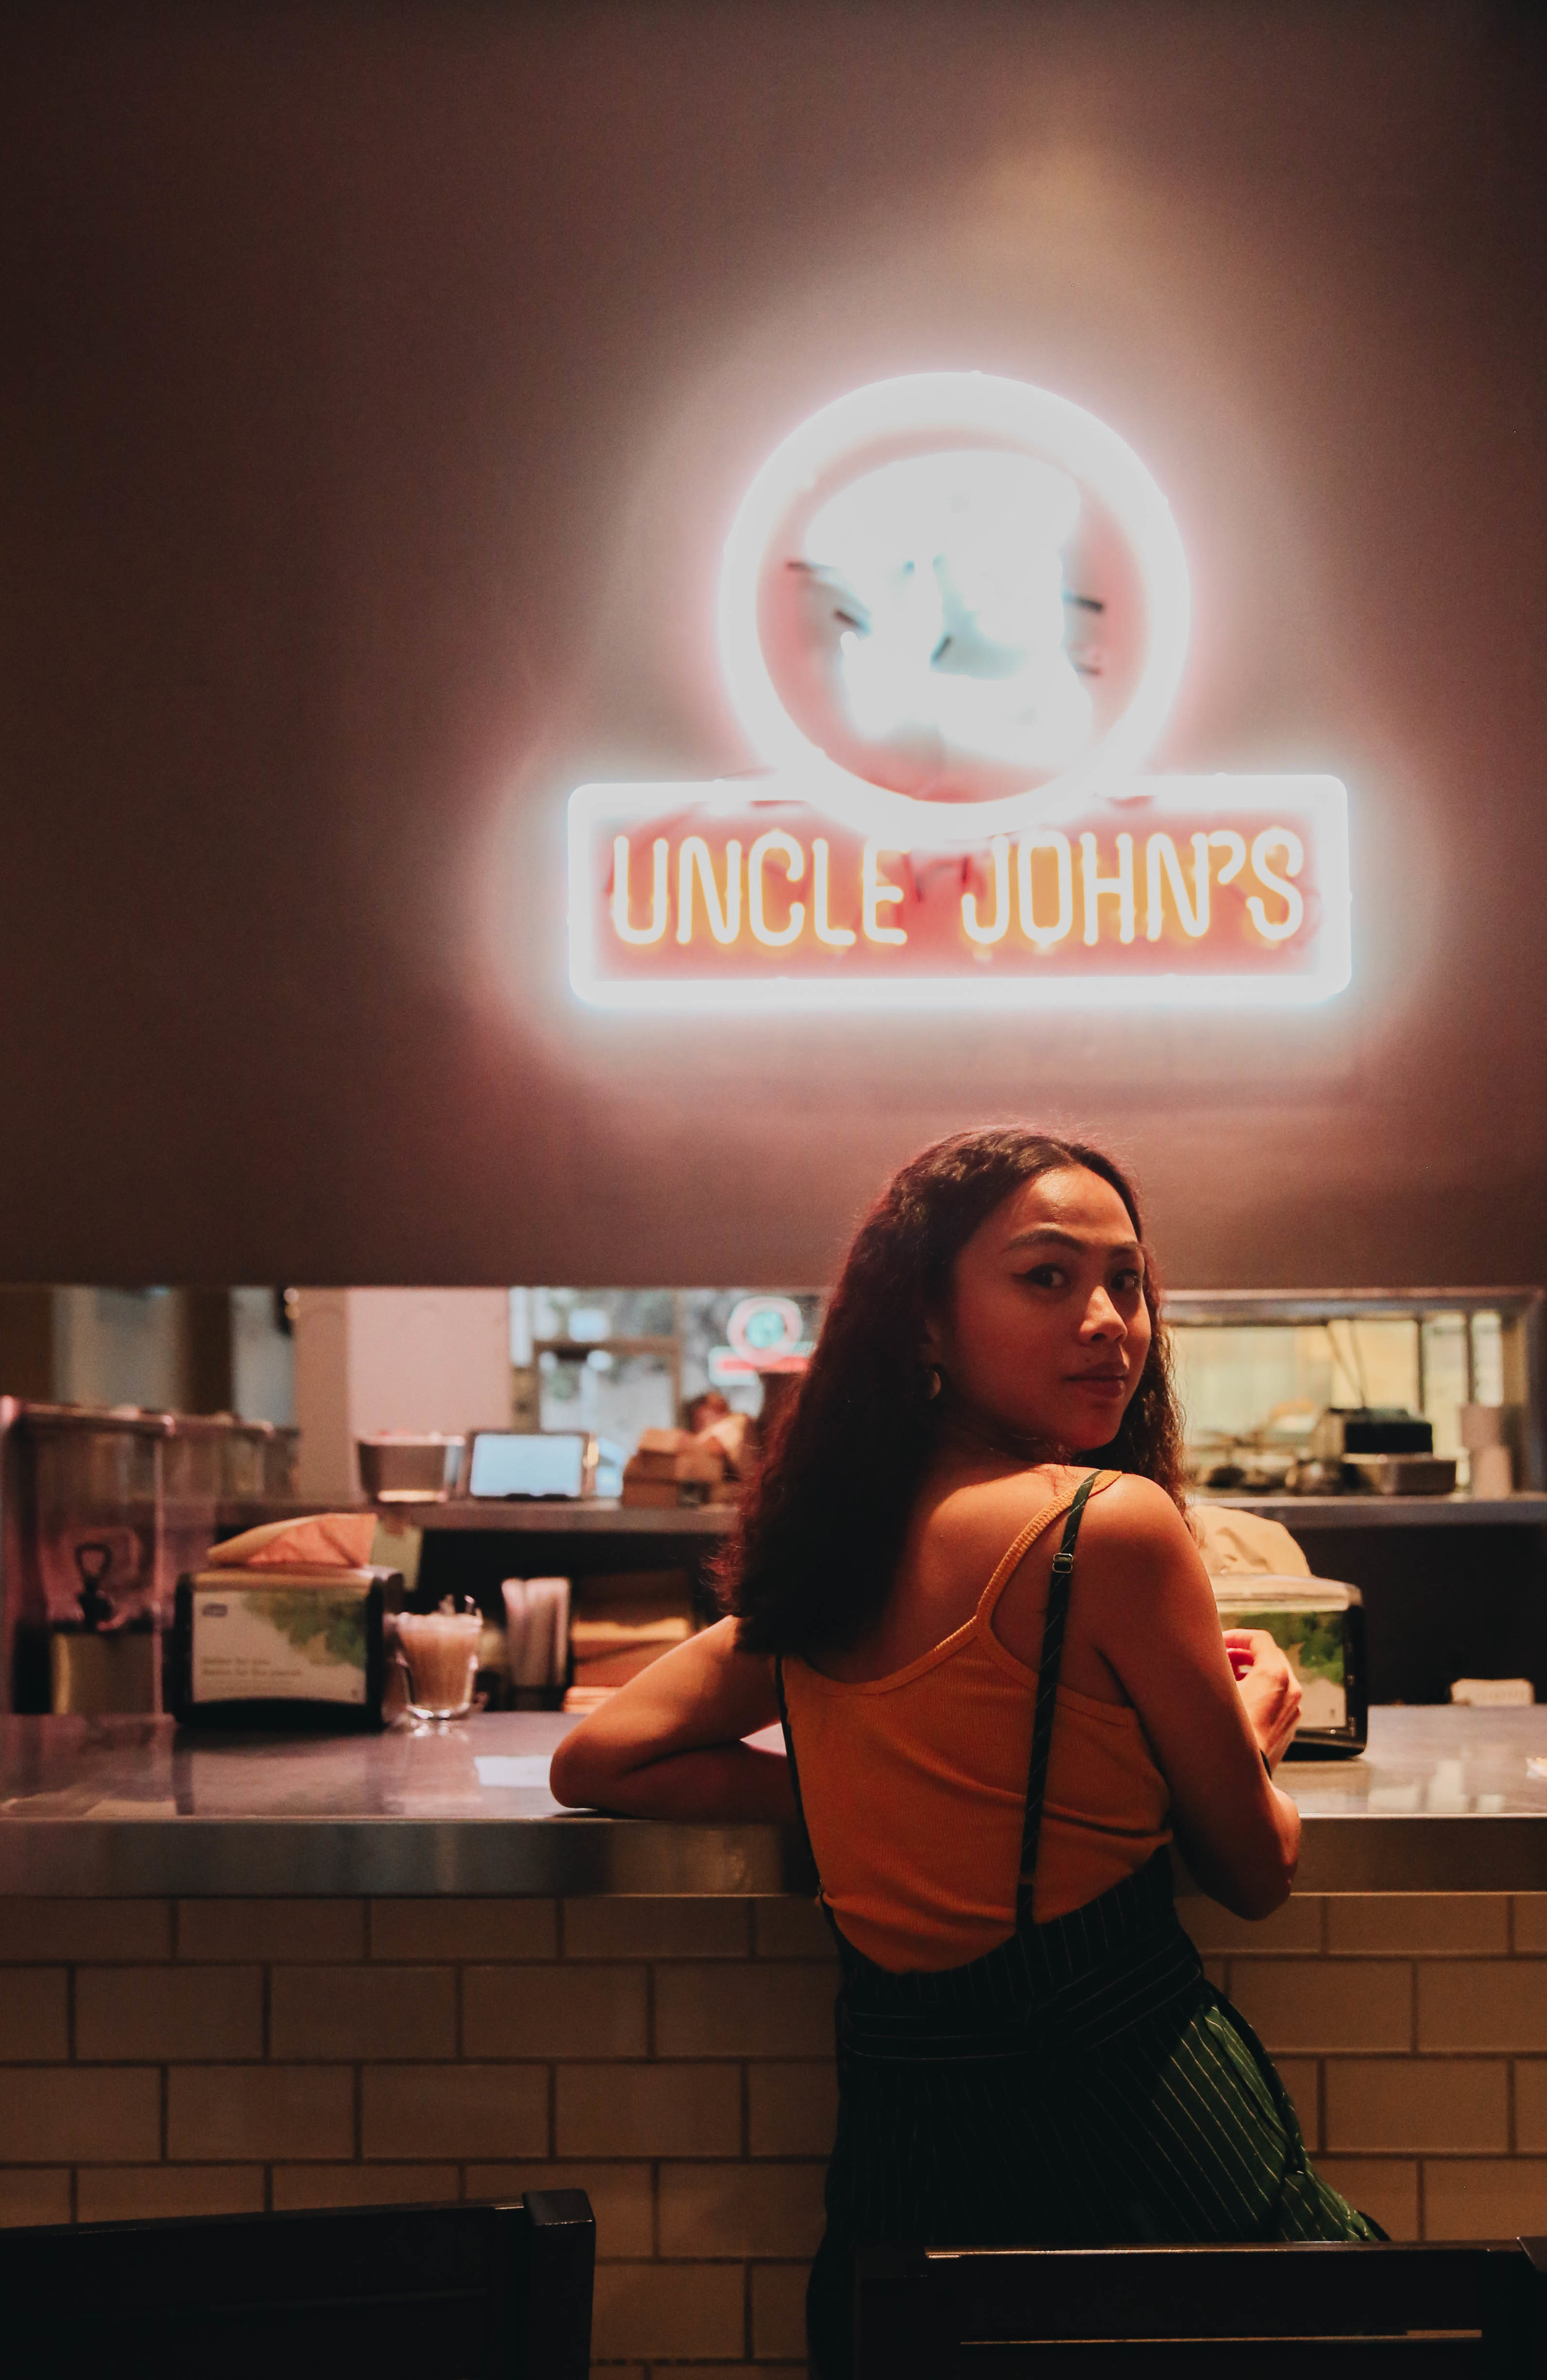 LA-Downtowner-Uncle-Johns-Cafe-3.jpg